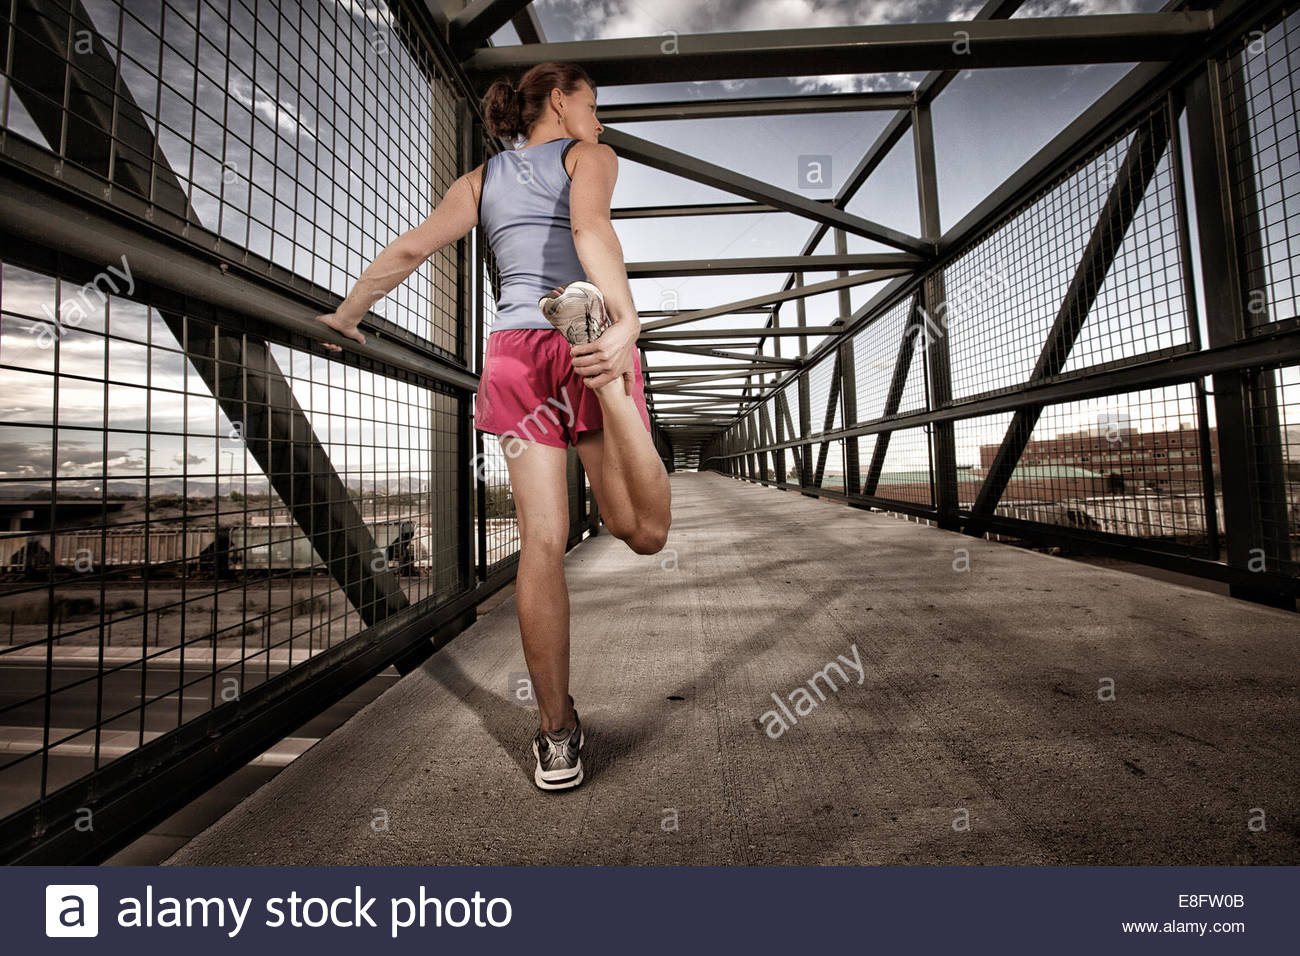 USA, Colorado, Woman runner stretching on bridge - Stock Image